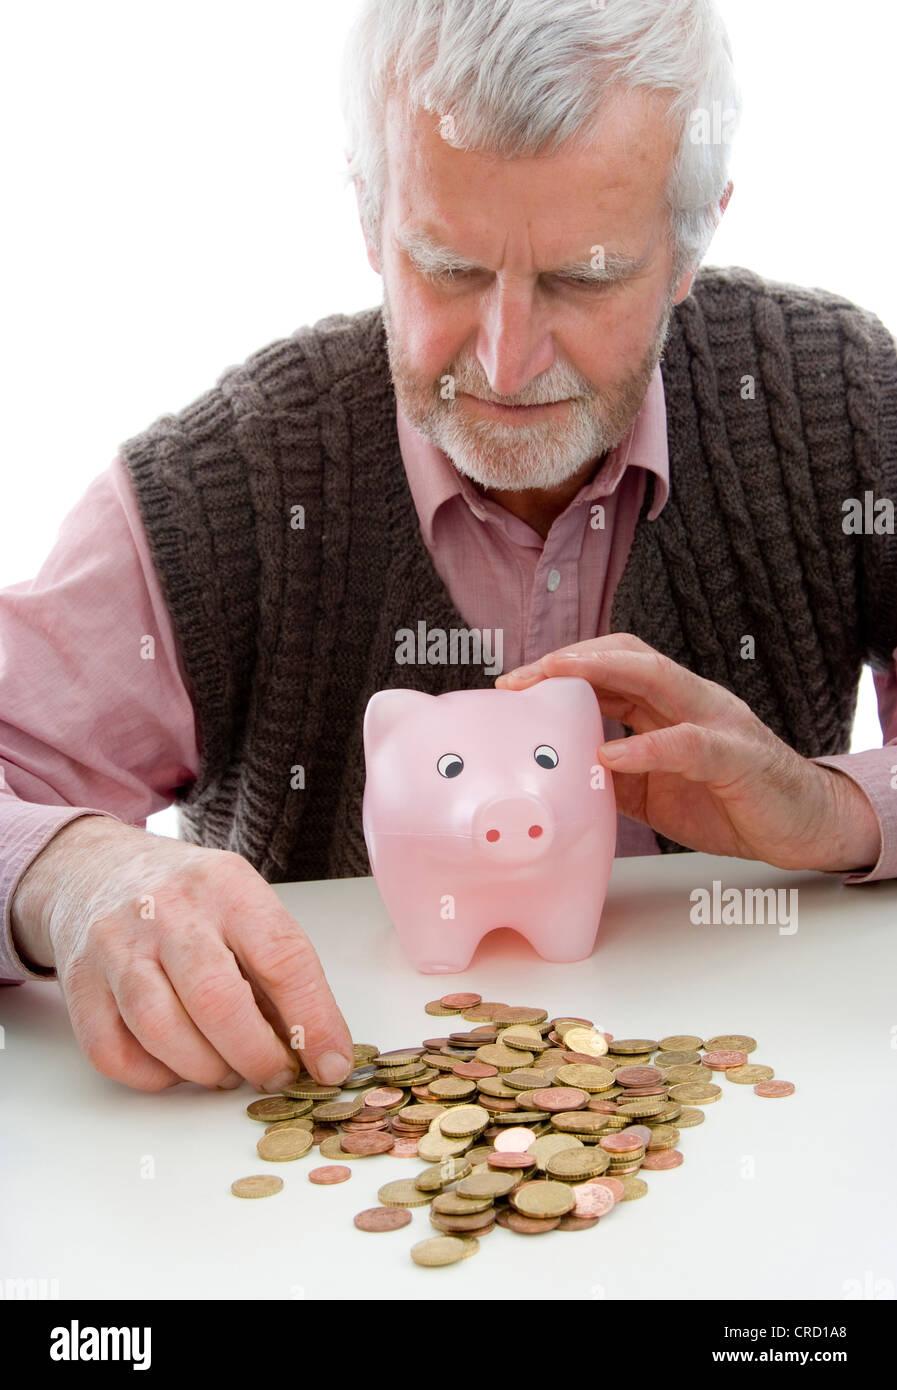 symbolic for retiree with minimum pension - Stock Image